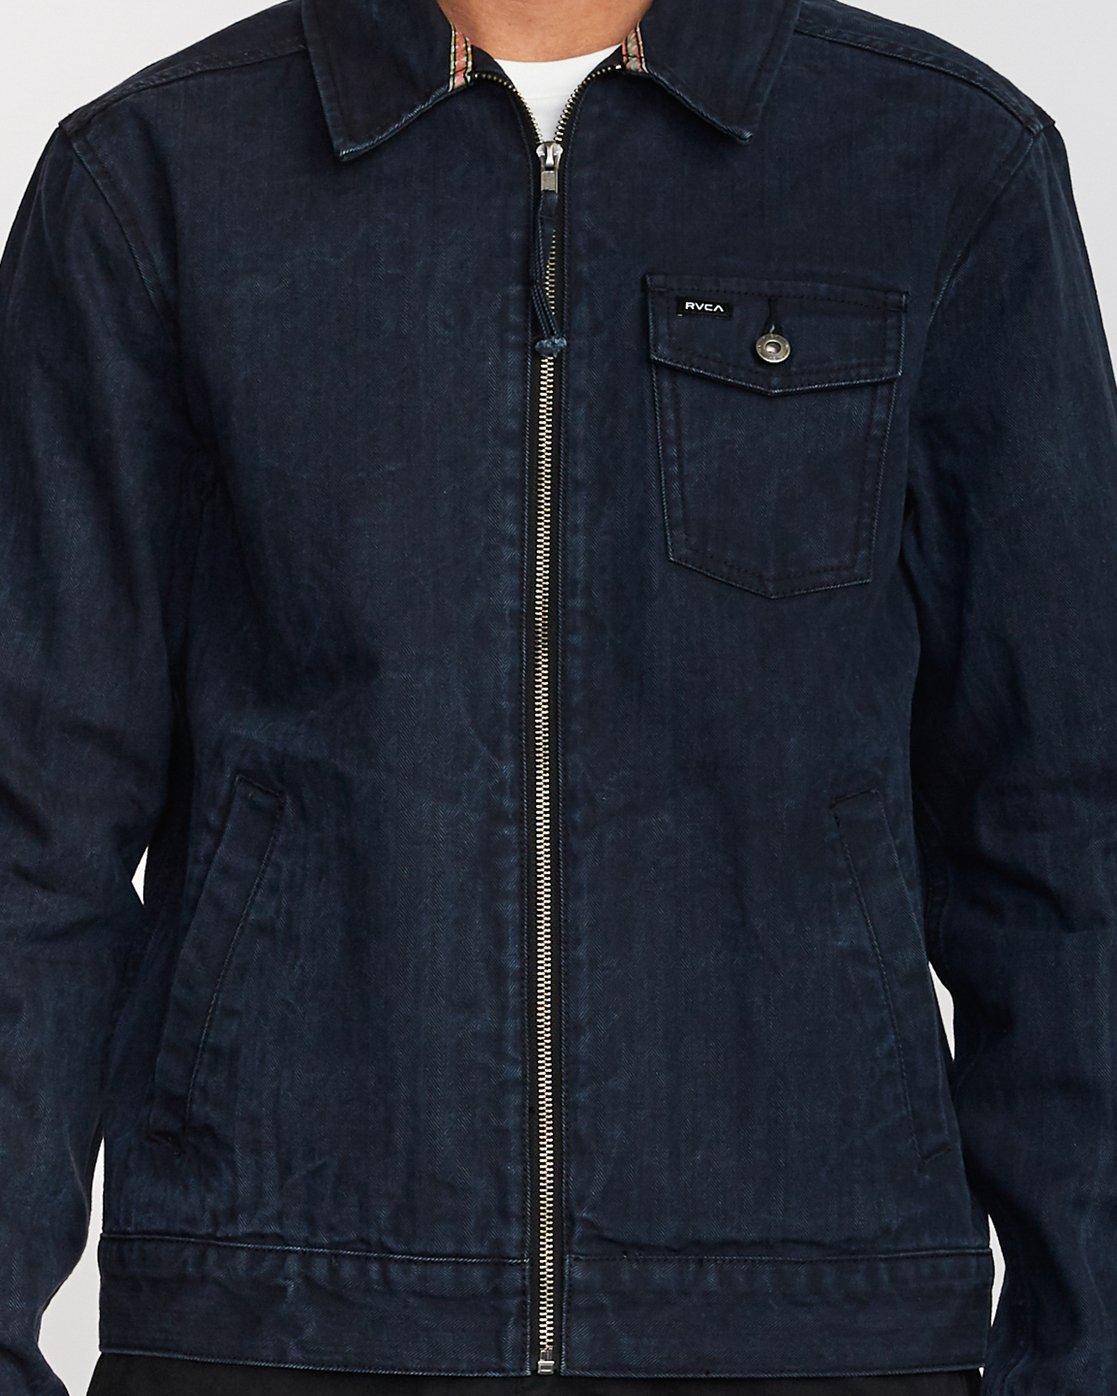 5 Hi - rade - Jeans-Jacke für Männer Blau Q1JKRFRVF9 RVCA